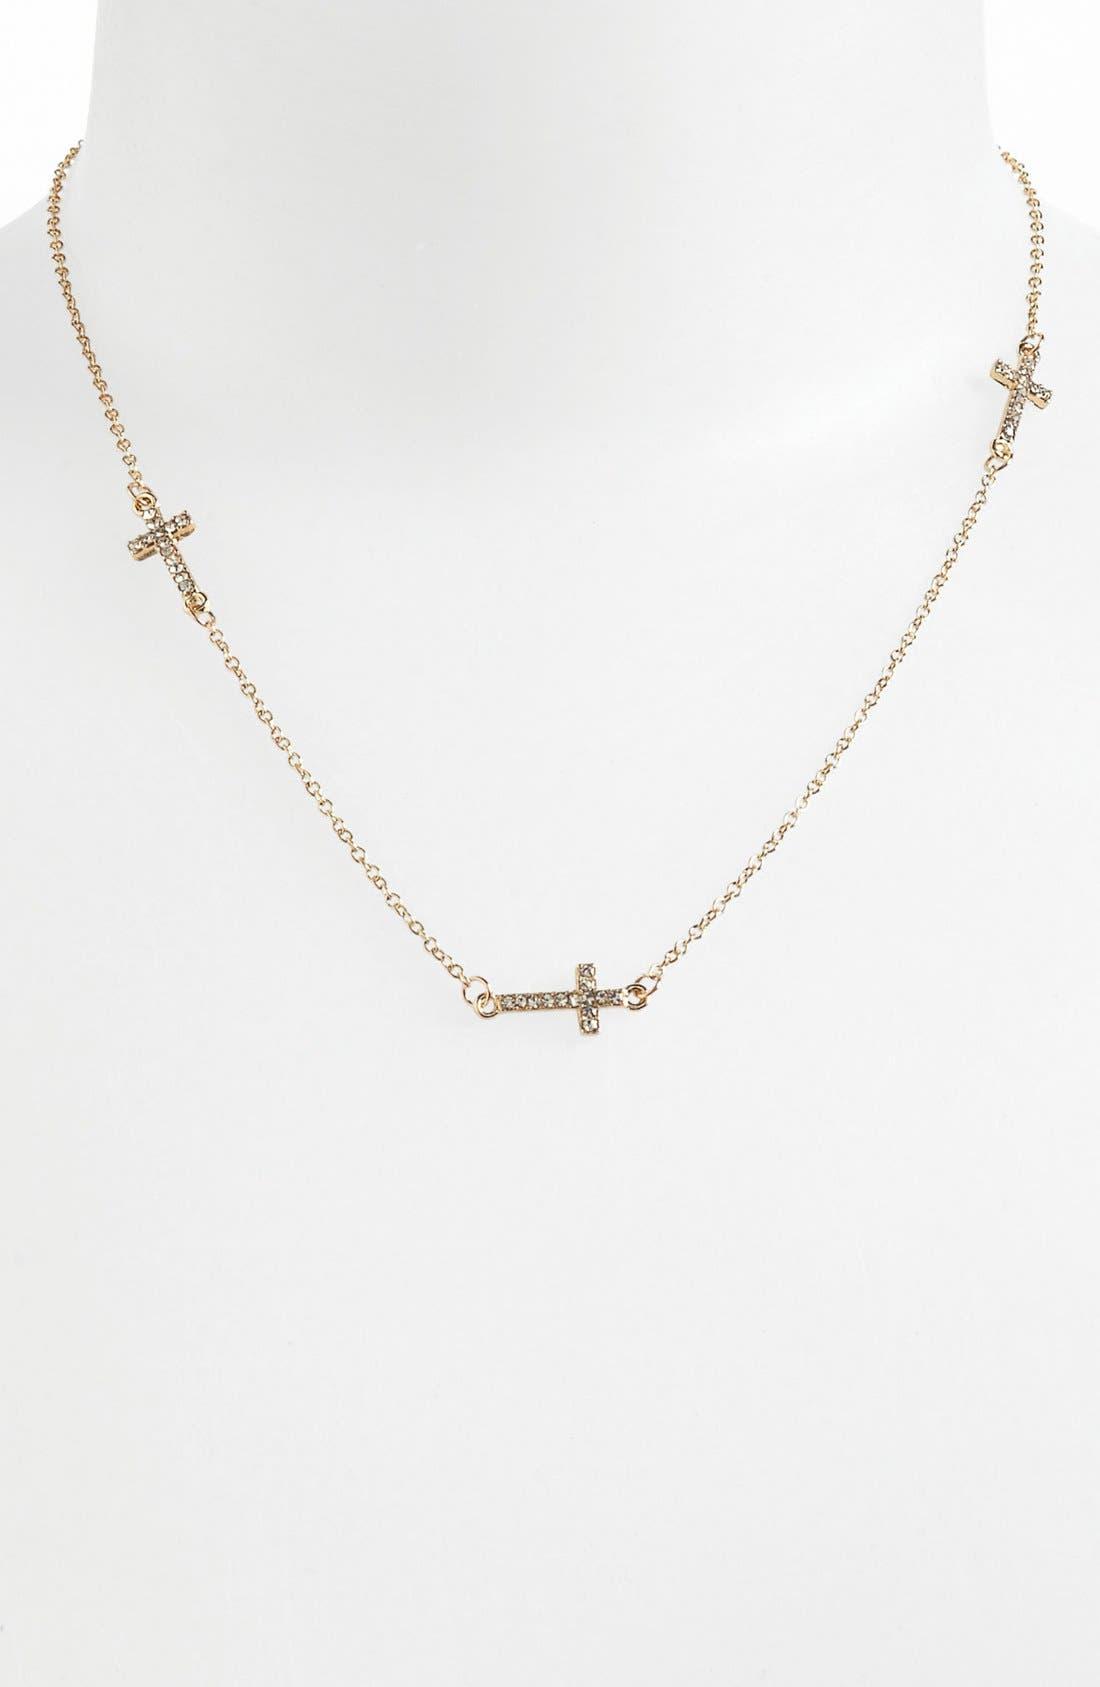 Main Image - Devan 'Dainty Cross' Necklace